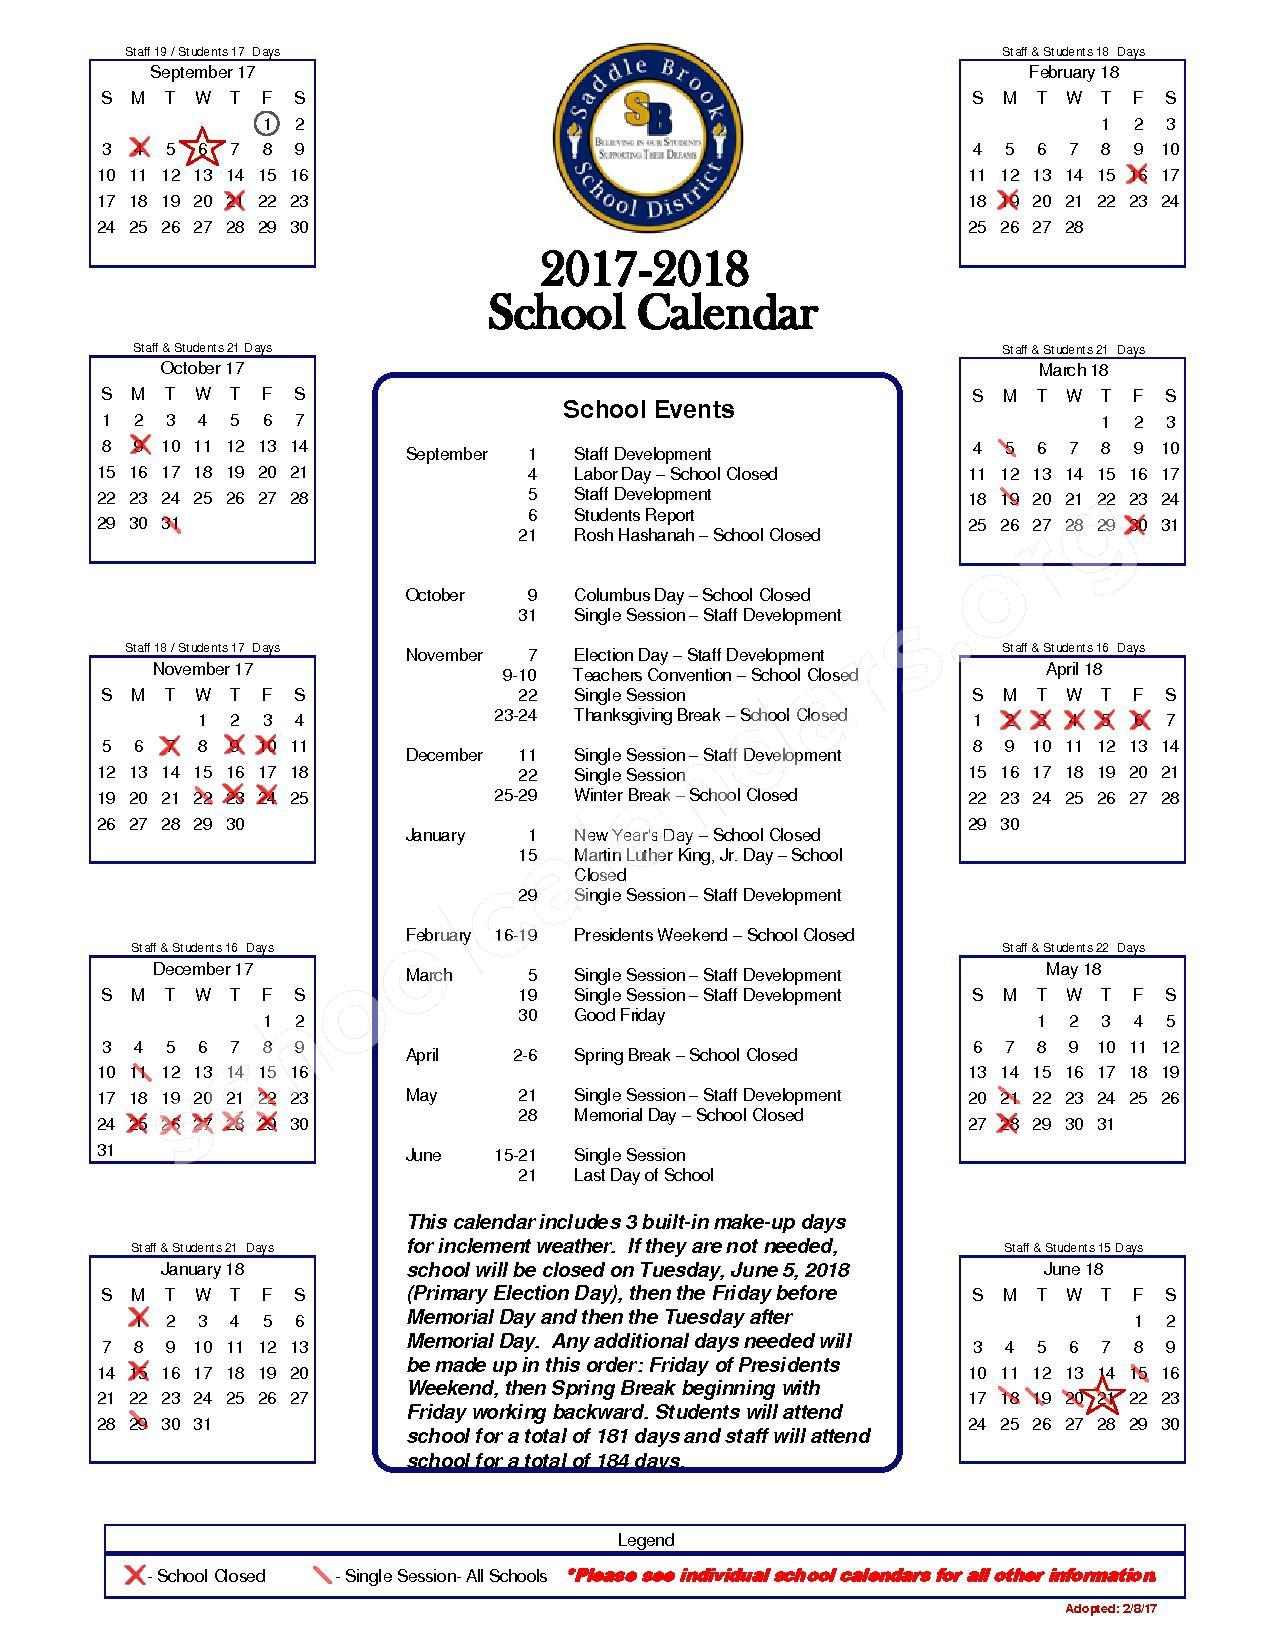 2017 - 2018 District Calendar – Saddle Brook School District – page 1